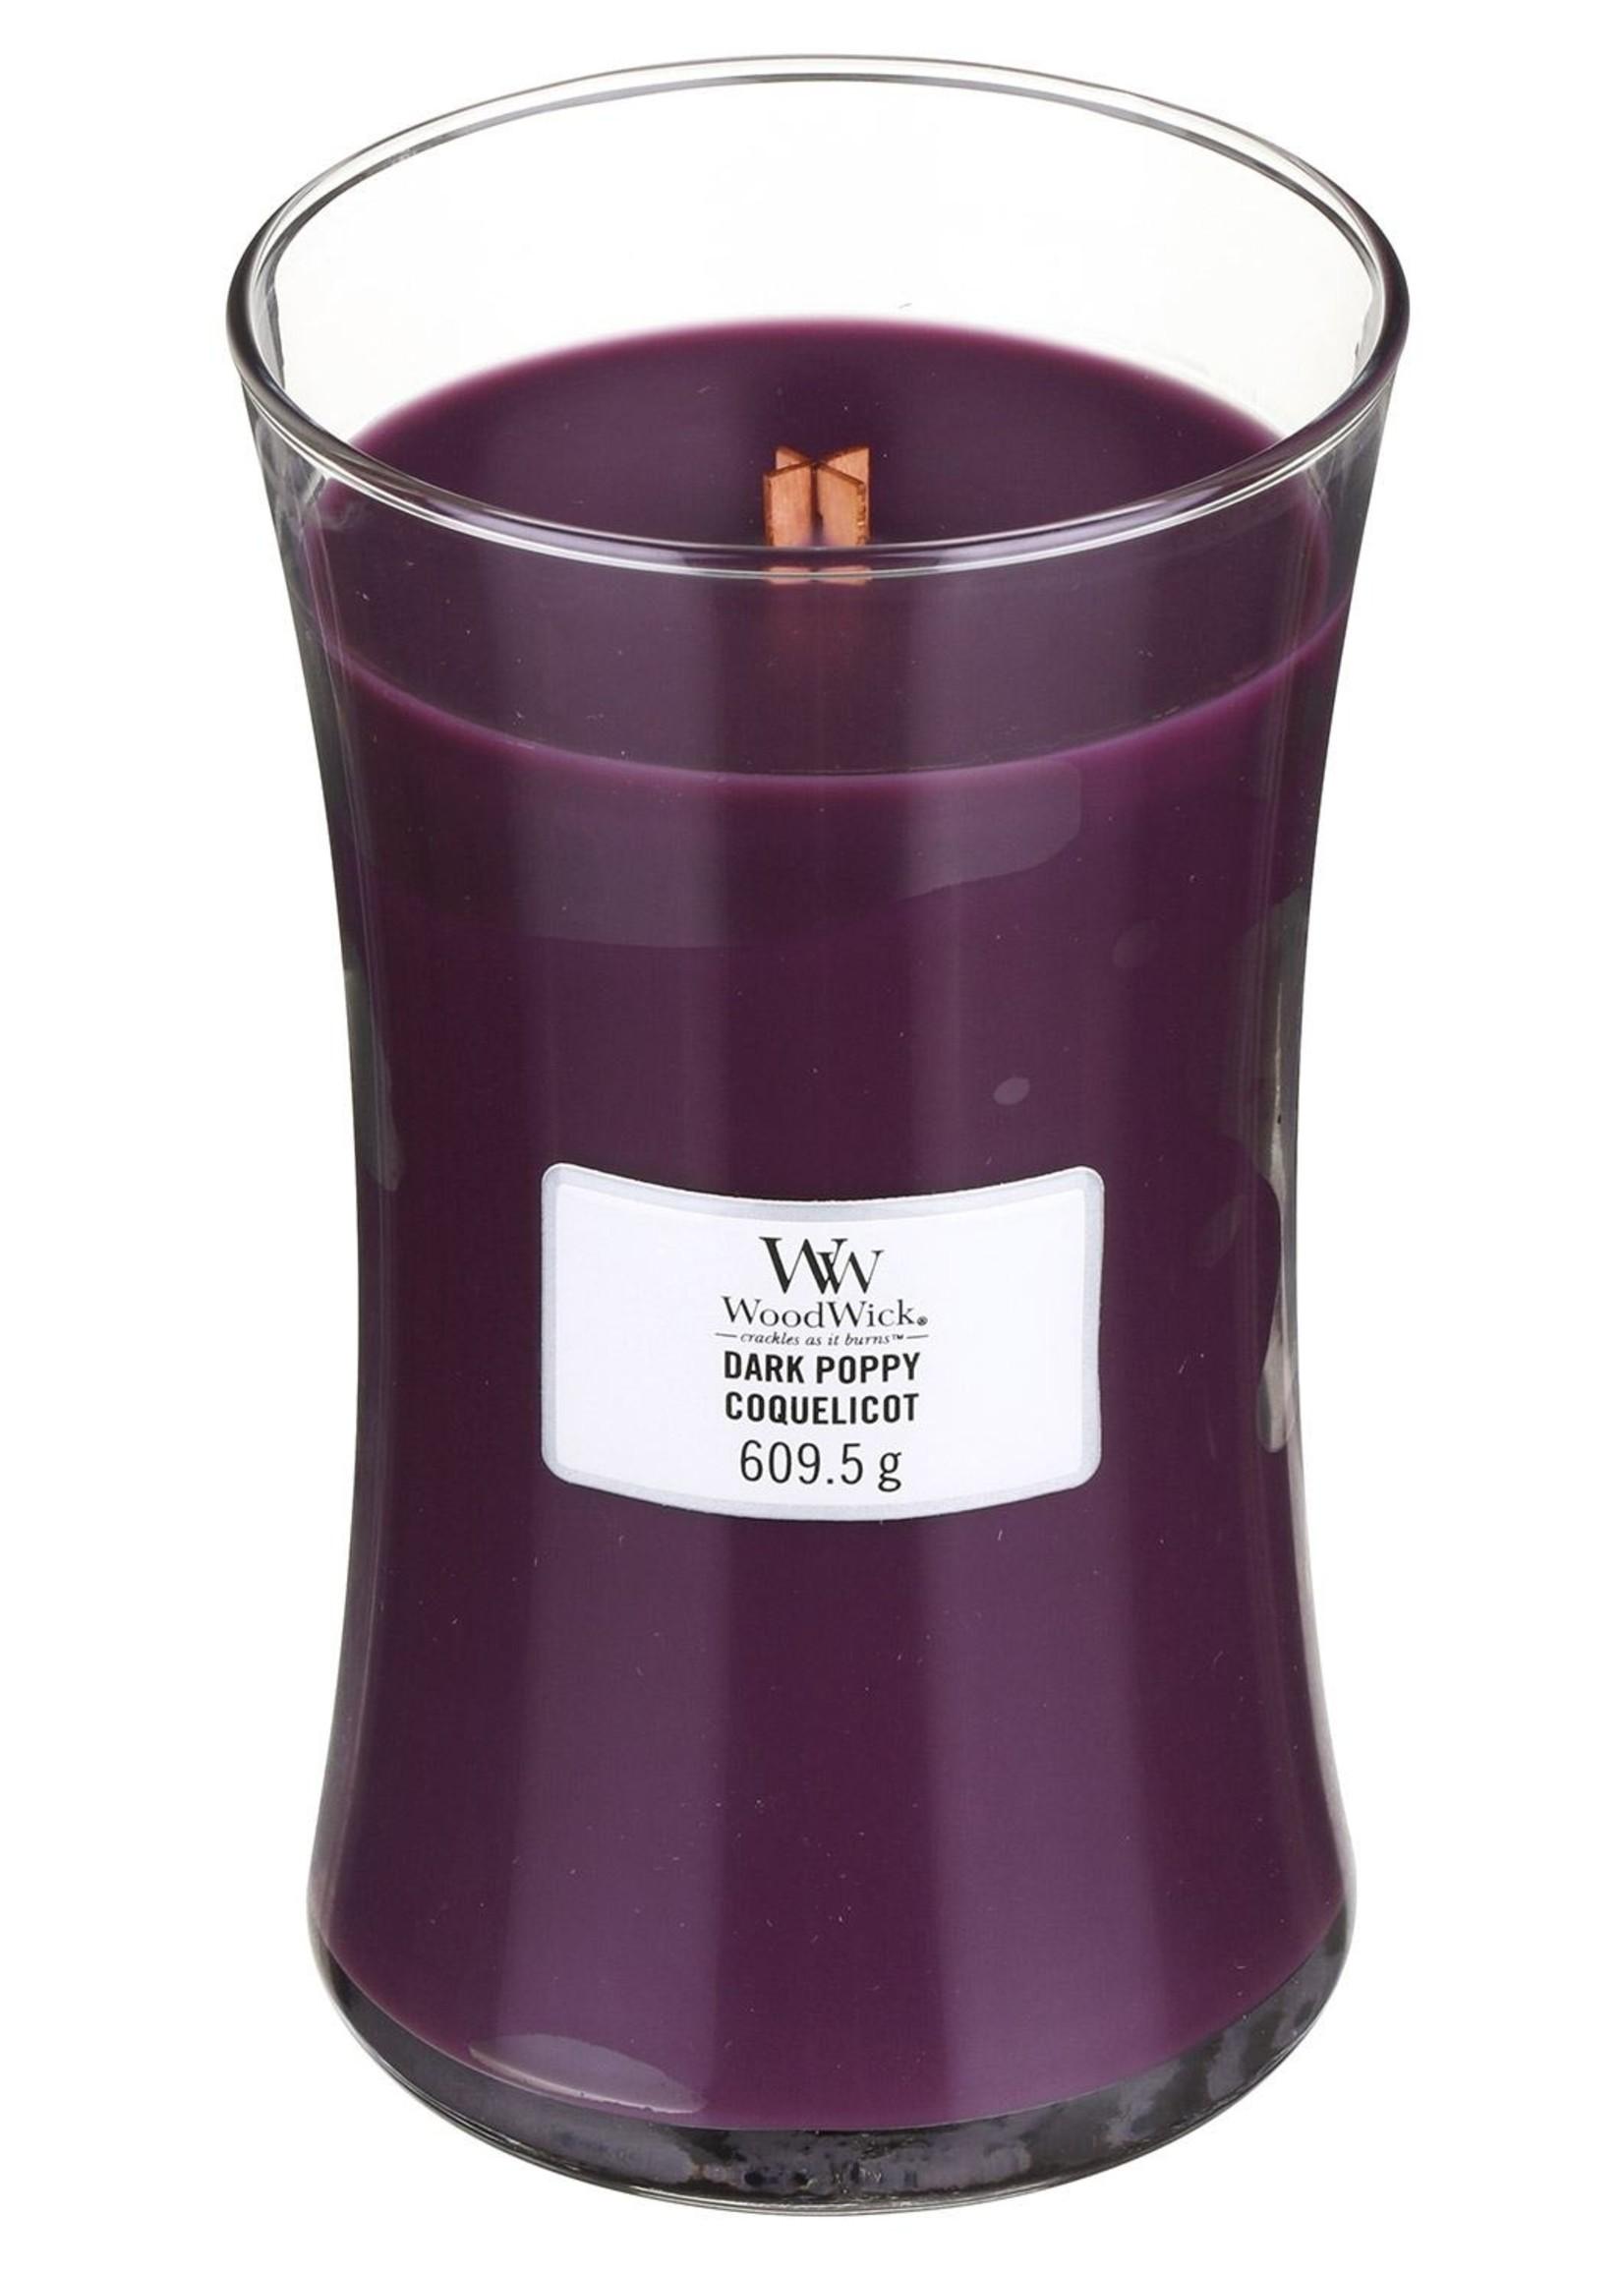 Woodwick Woodwick Dark Poppy Large Candle